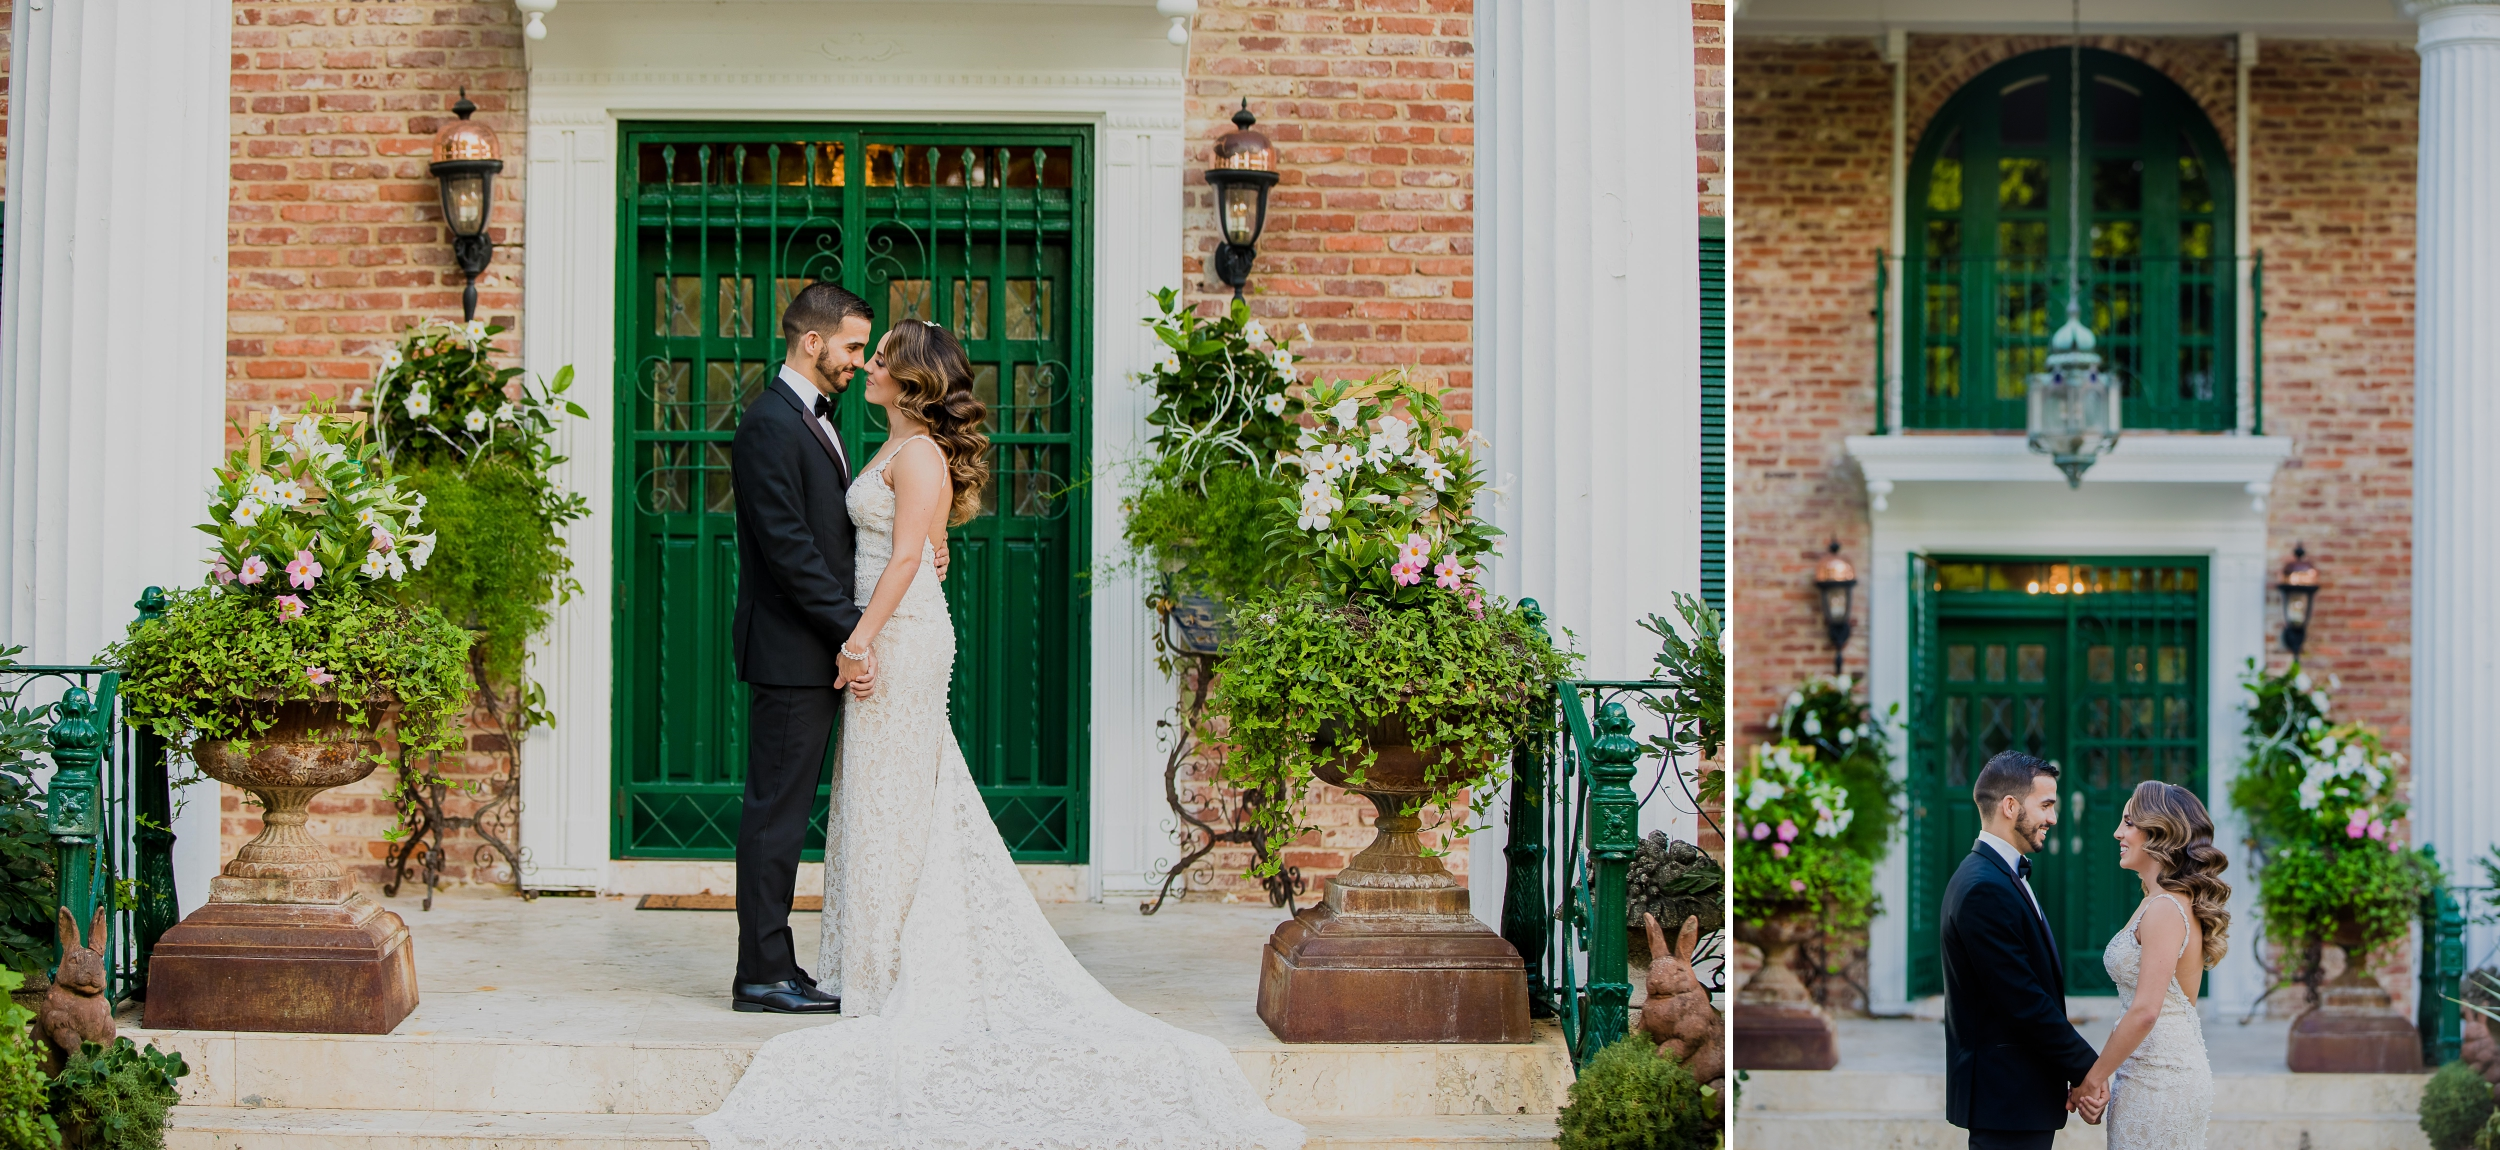 Wedding Miller Plantation Photography by Santy Martinez 8.jpg